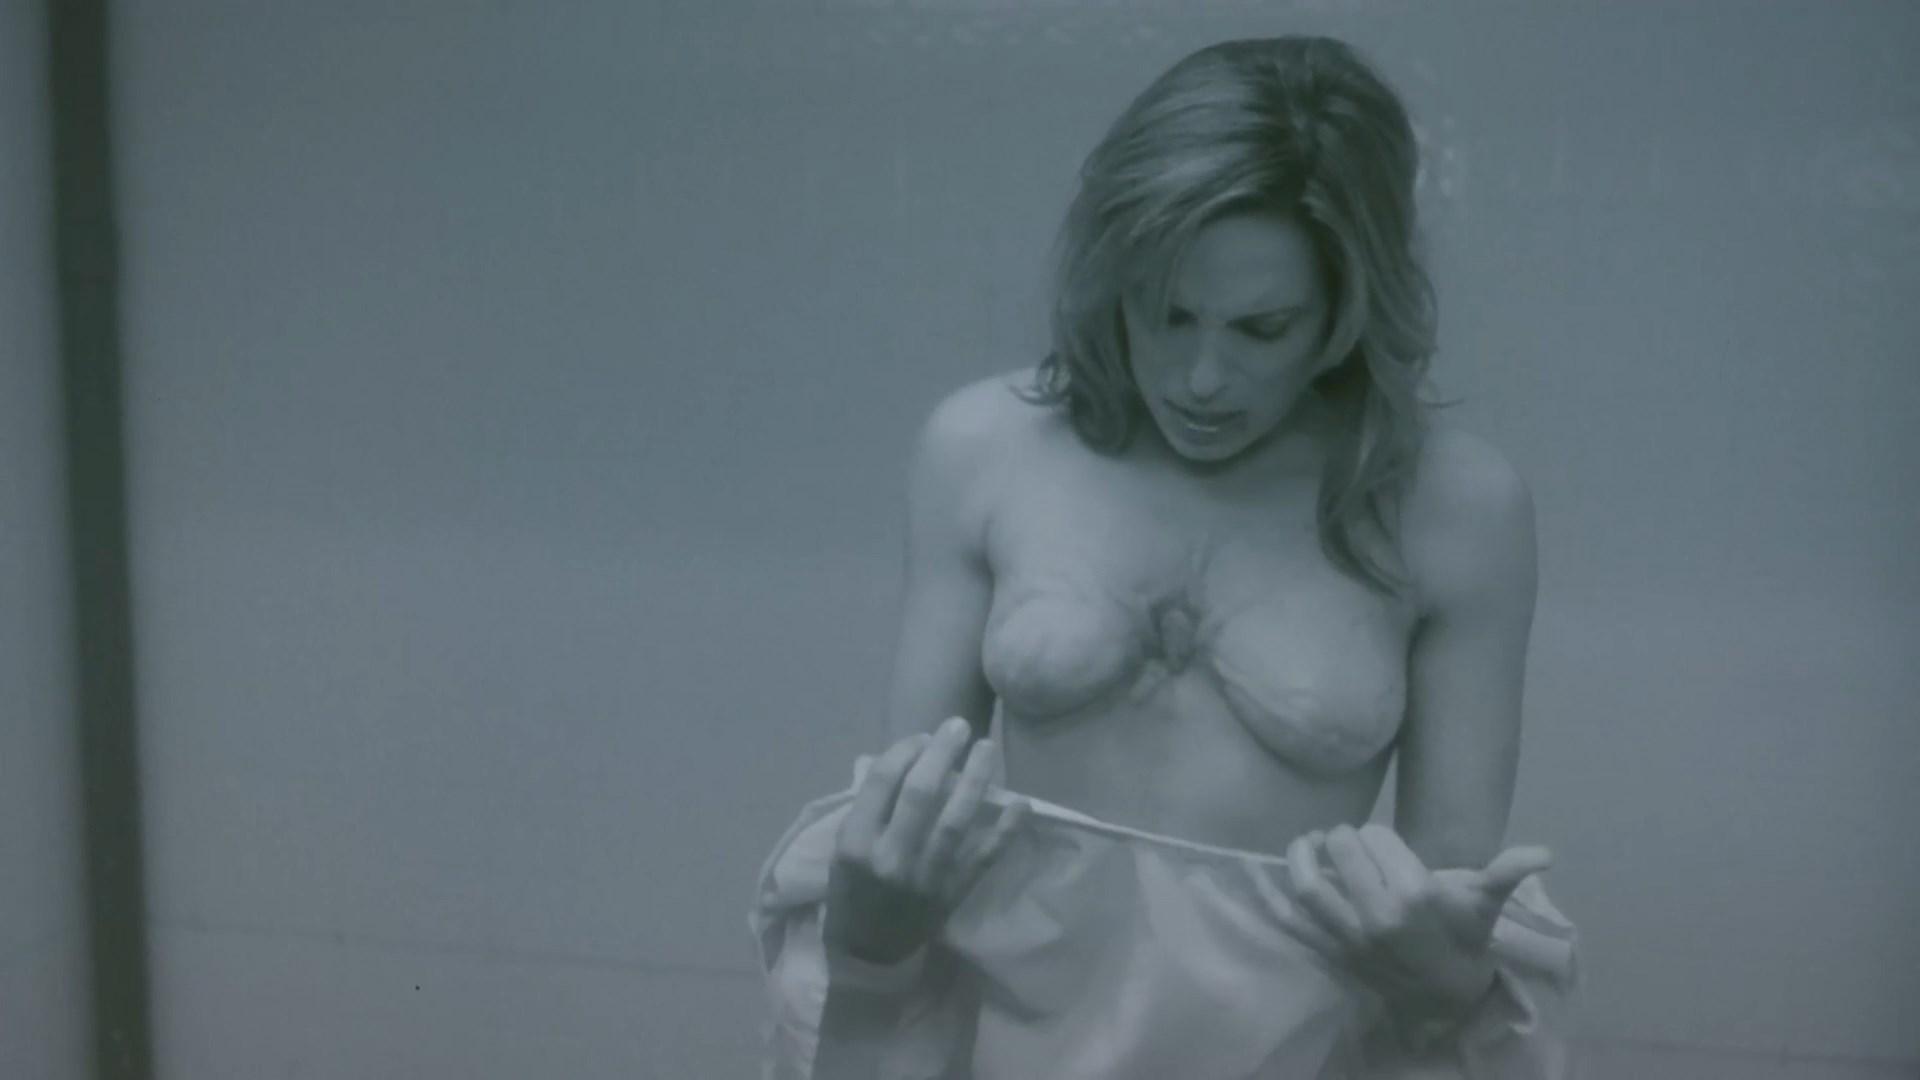 Neil patrick harris nude naked